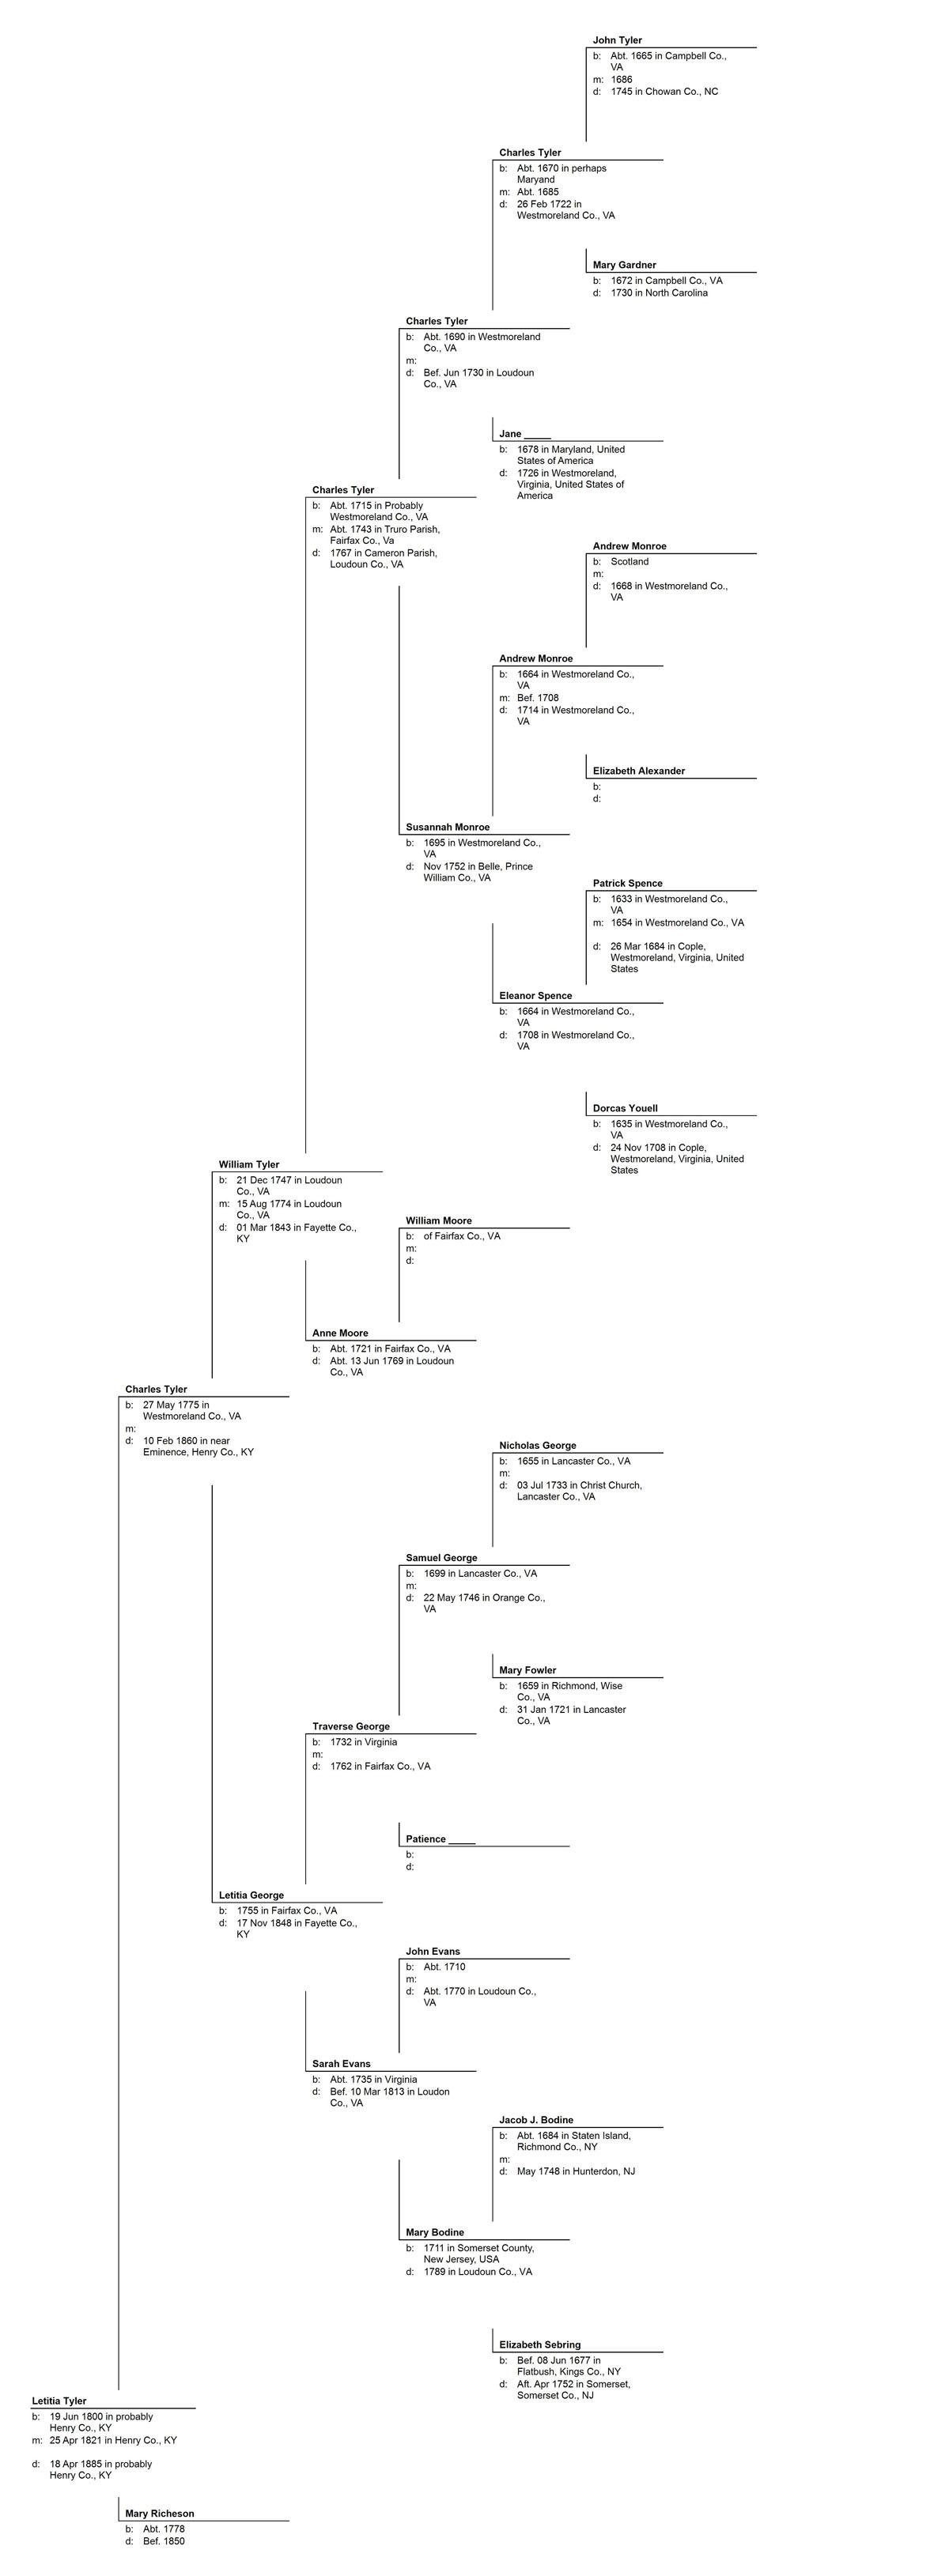 Pedigree Chart for Letitia Tyler